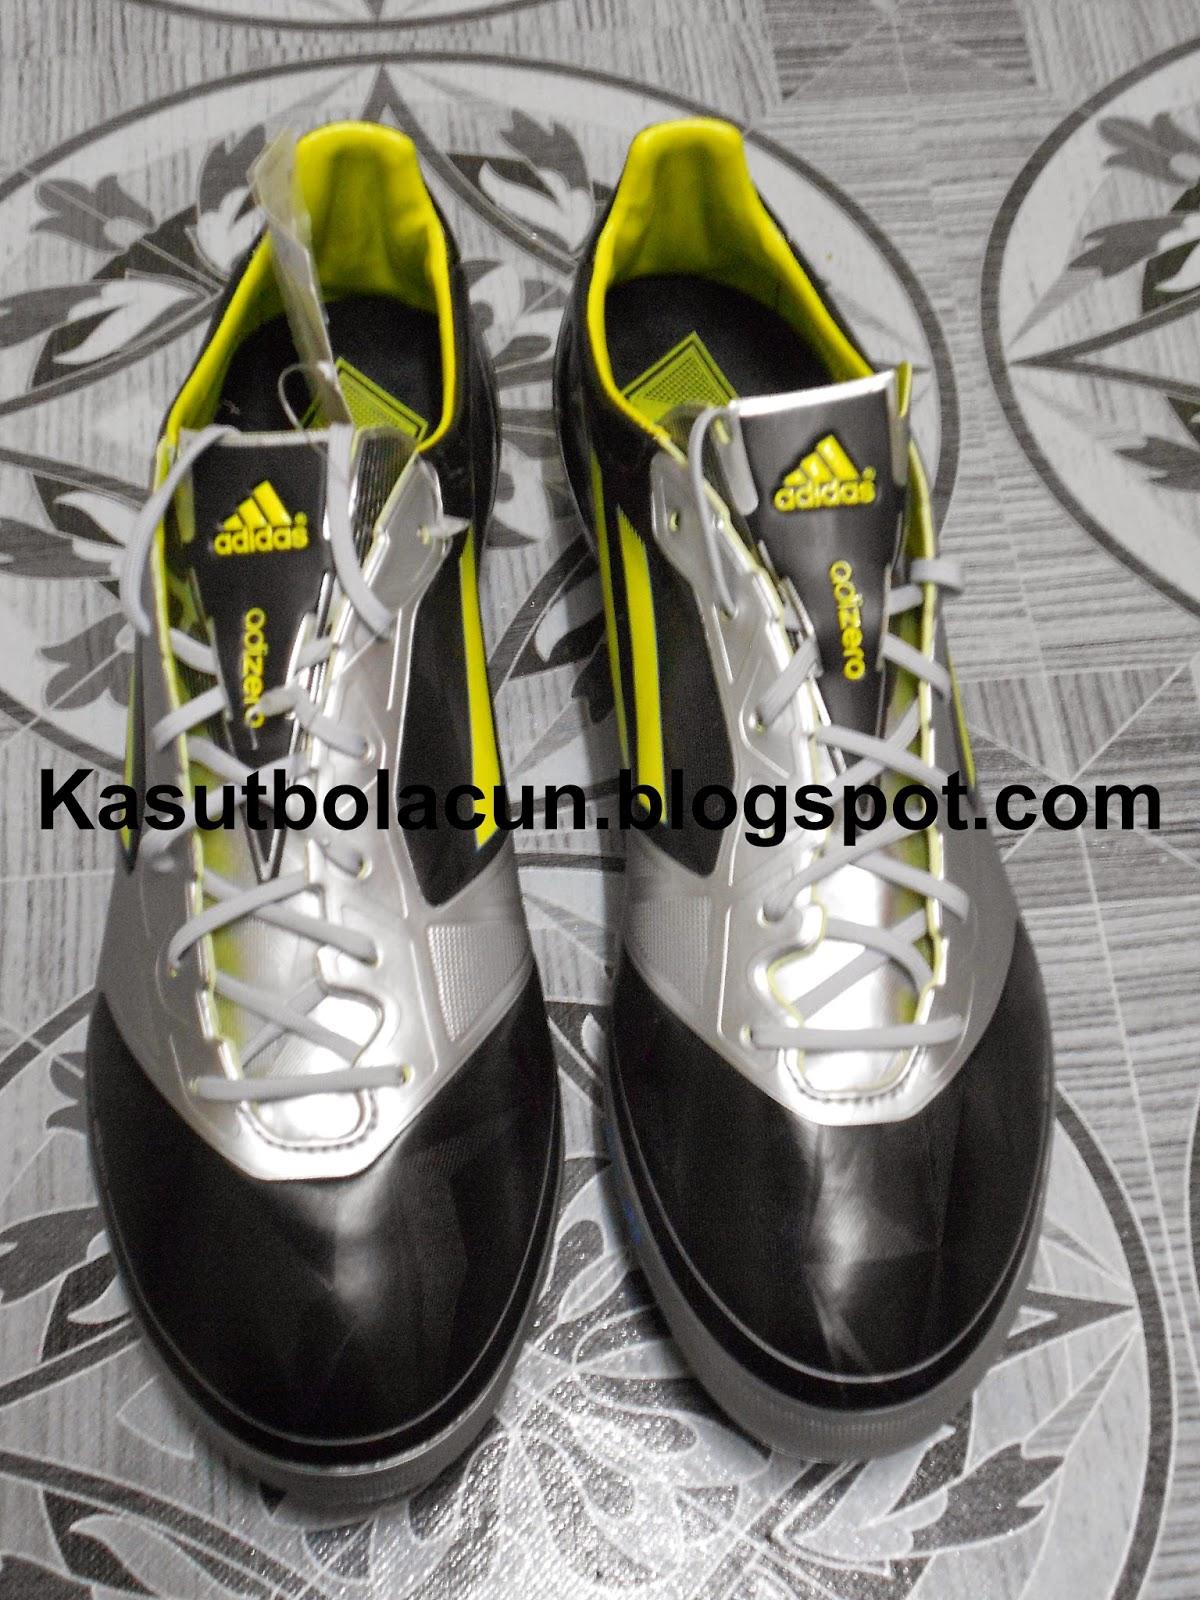 http://kasutbolacun.blogspot.com/2015/02/adidas-f50-adizero-micoach-1-fg-hitam.html